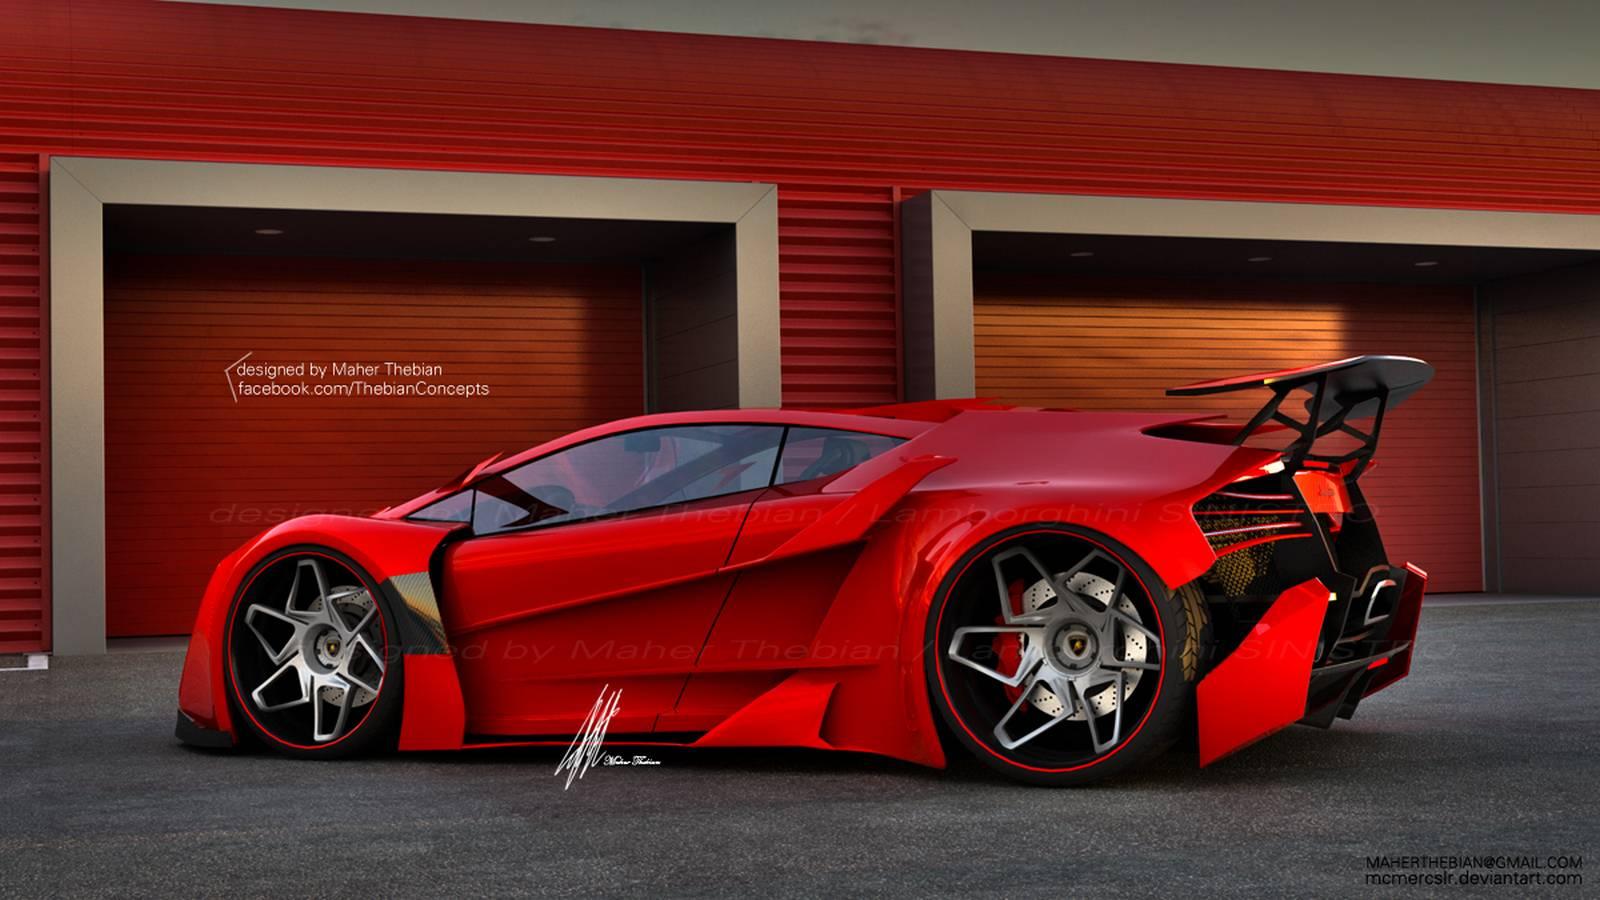 Charming Render: Lamborghini Sinistro By Maher Thebian Home Design Ideas